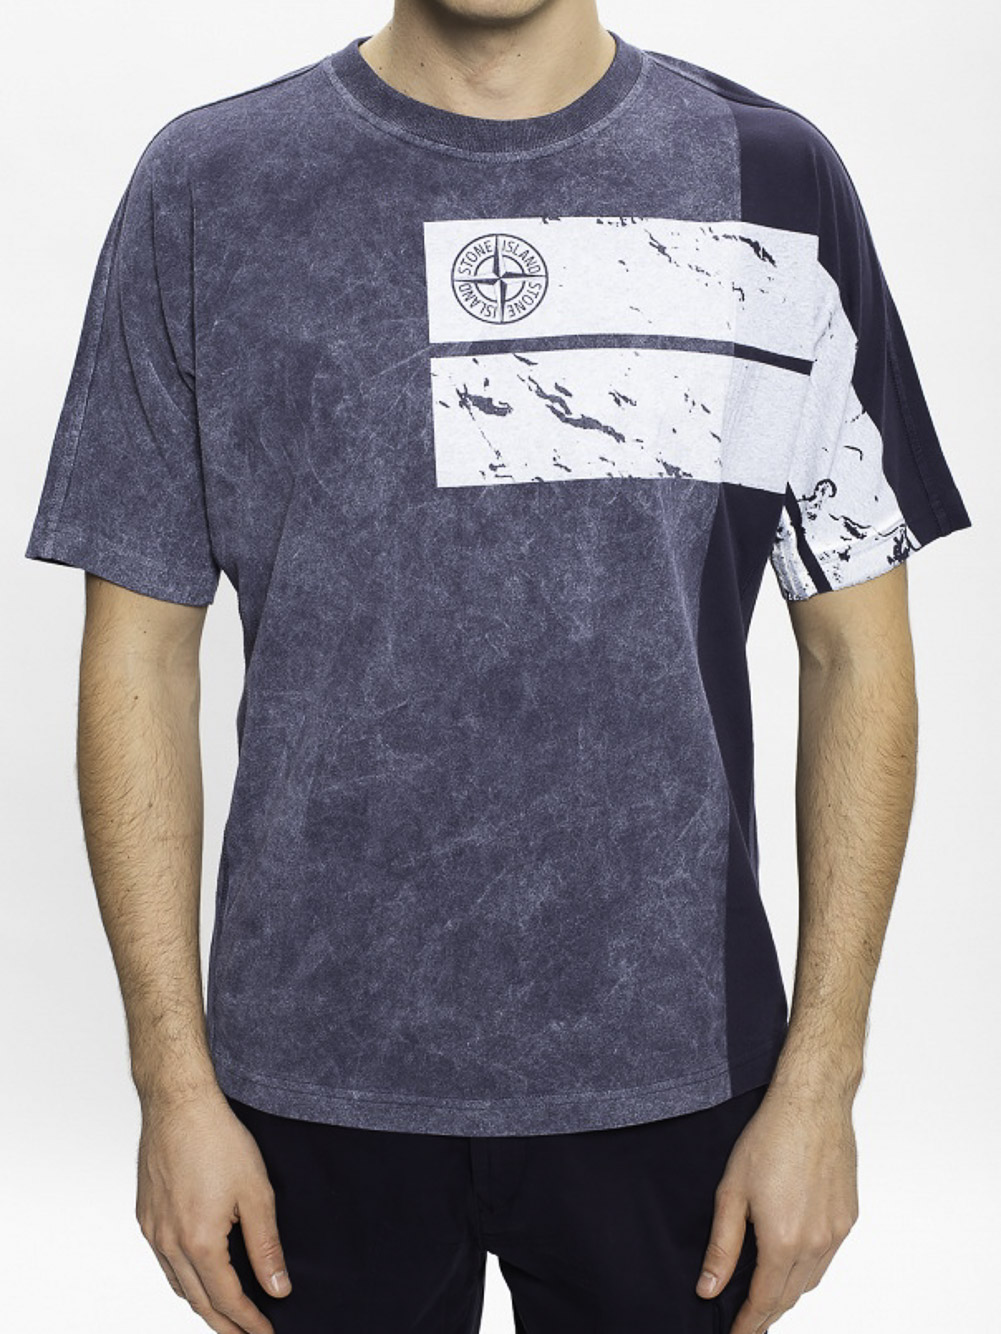 STONE ISLAND Μπλούζα T-Shirt MO731520892-V0028 ΓΚΡΙ